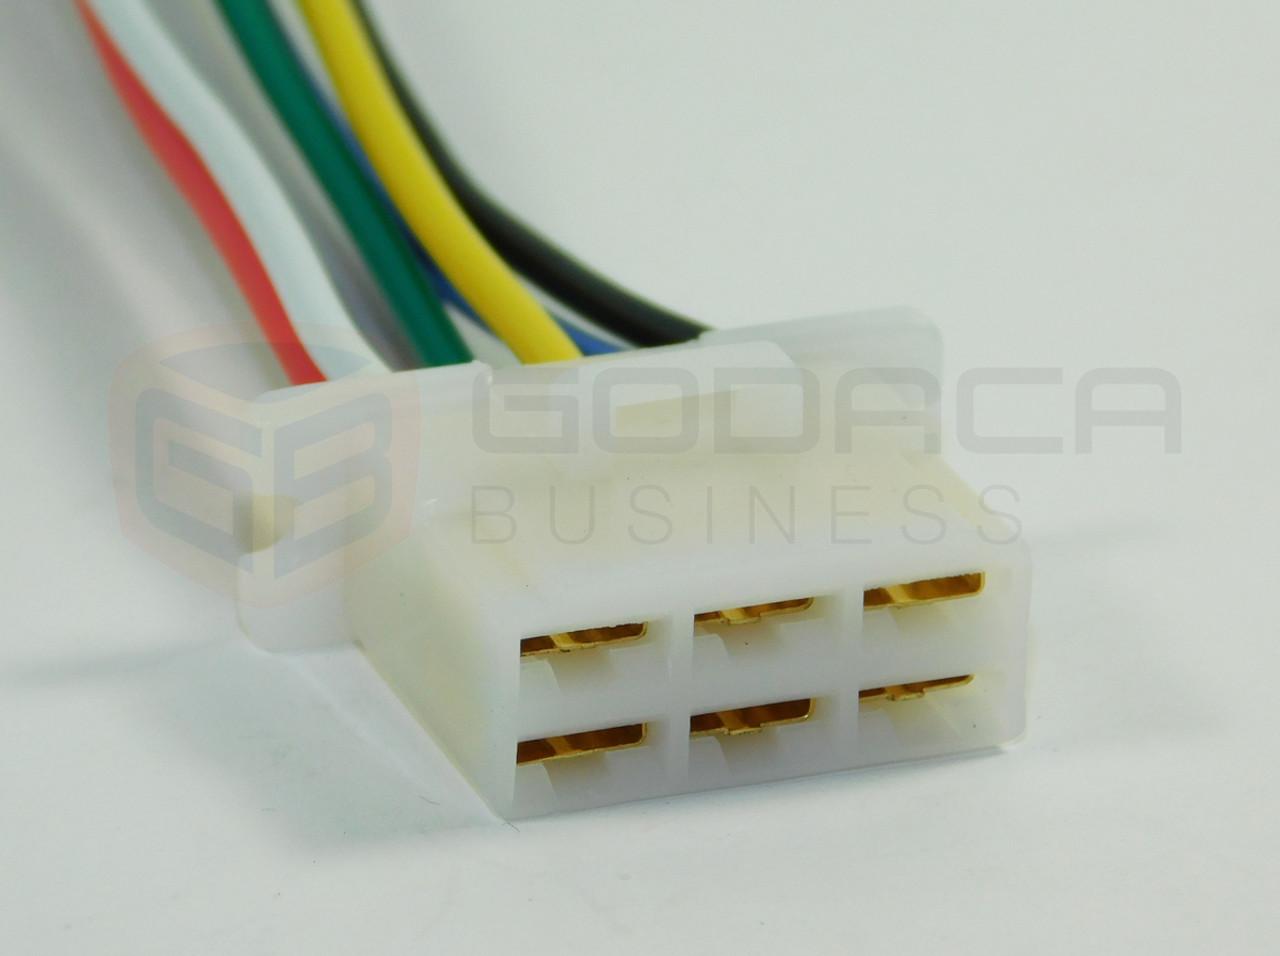 hight resolution of 1x connector alternator plug repair harness 6 way 6pin socket female terminal gm